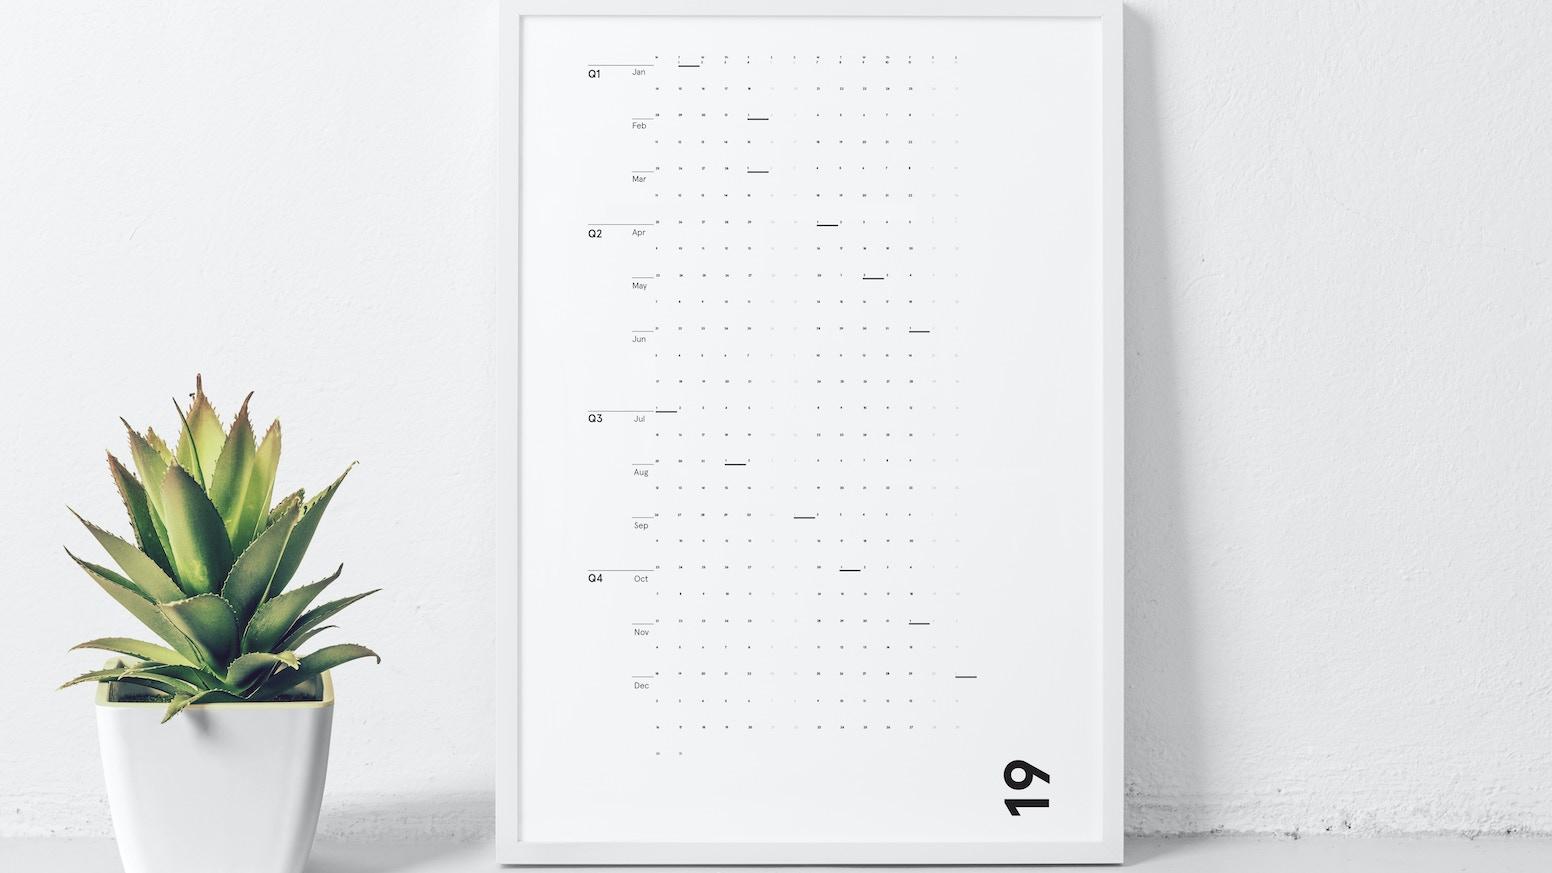 A wall calendar that will make 2019 feel like a breath of fresh air.